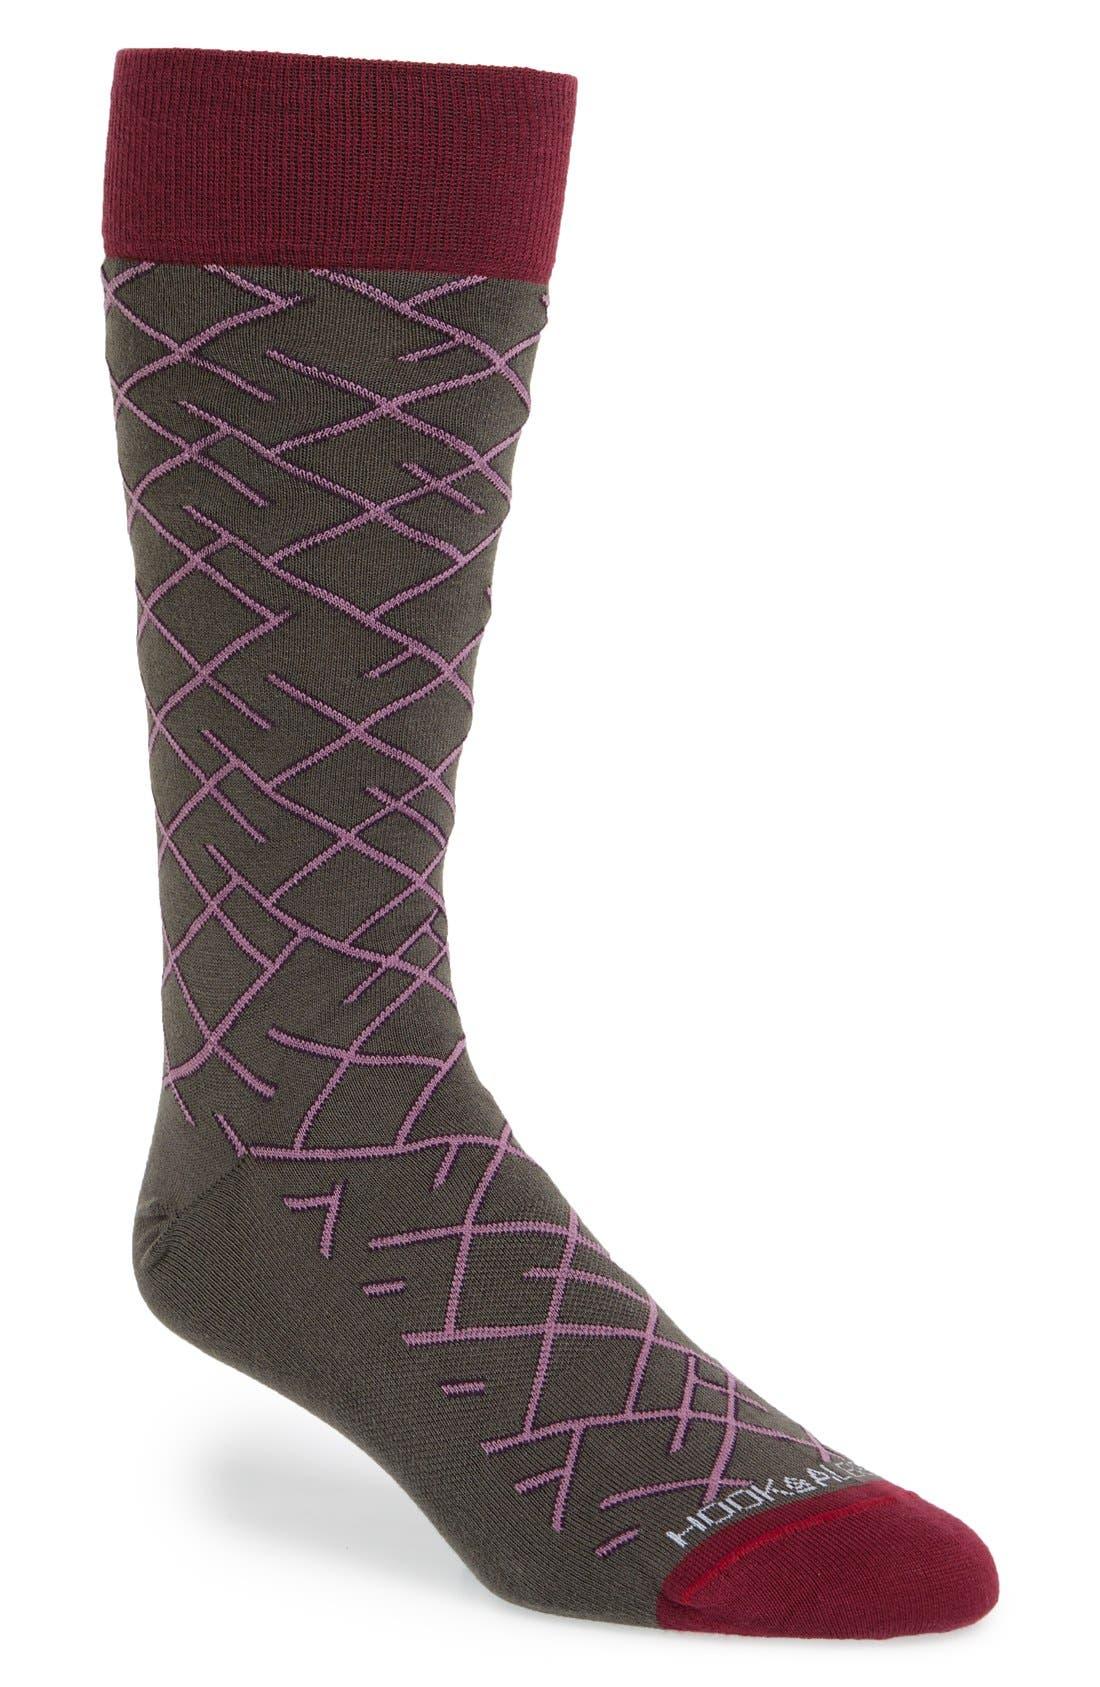 hook + ALBERT 'Diagonal Line' Socks | Nordstrom